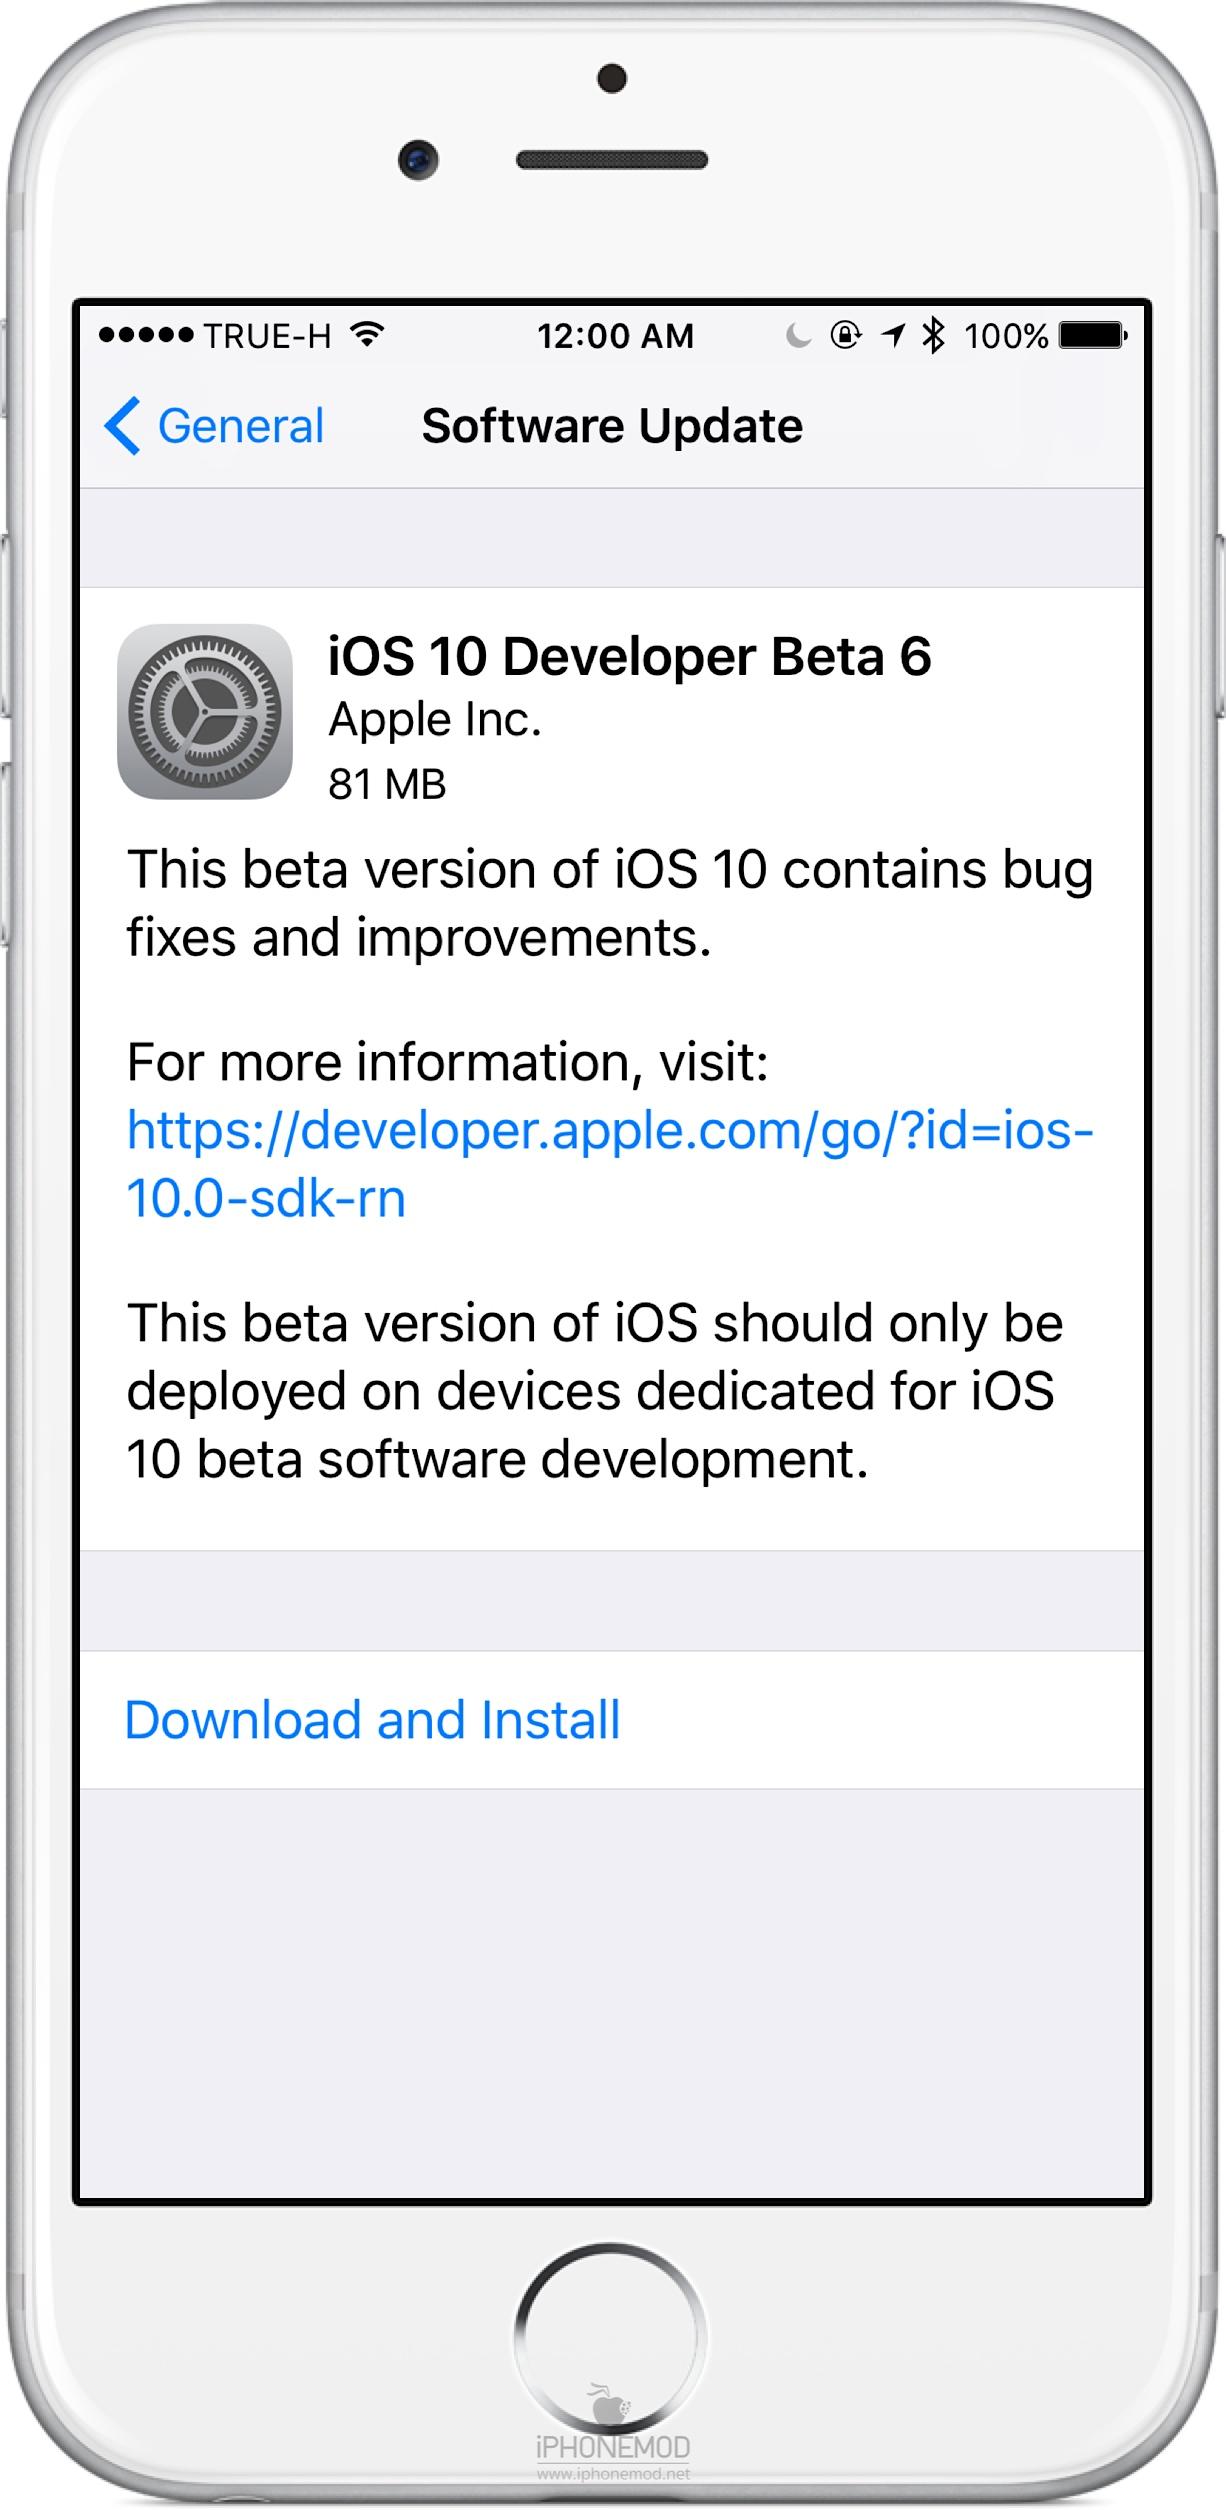 ios-10-dev-beta-6